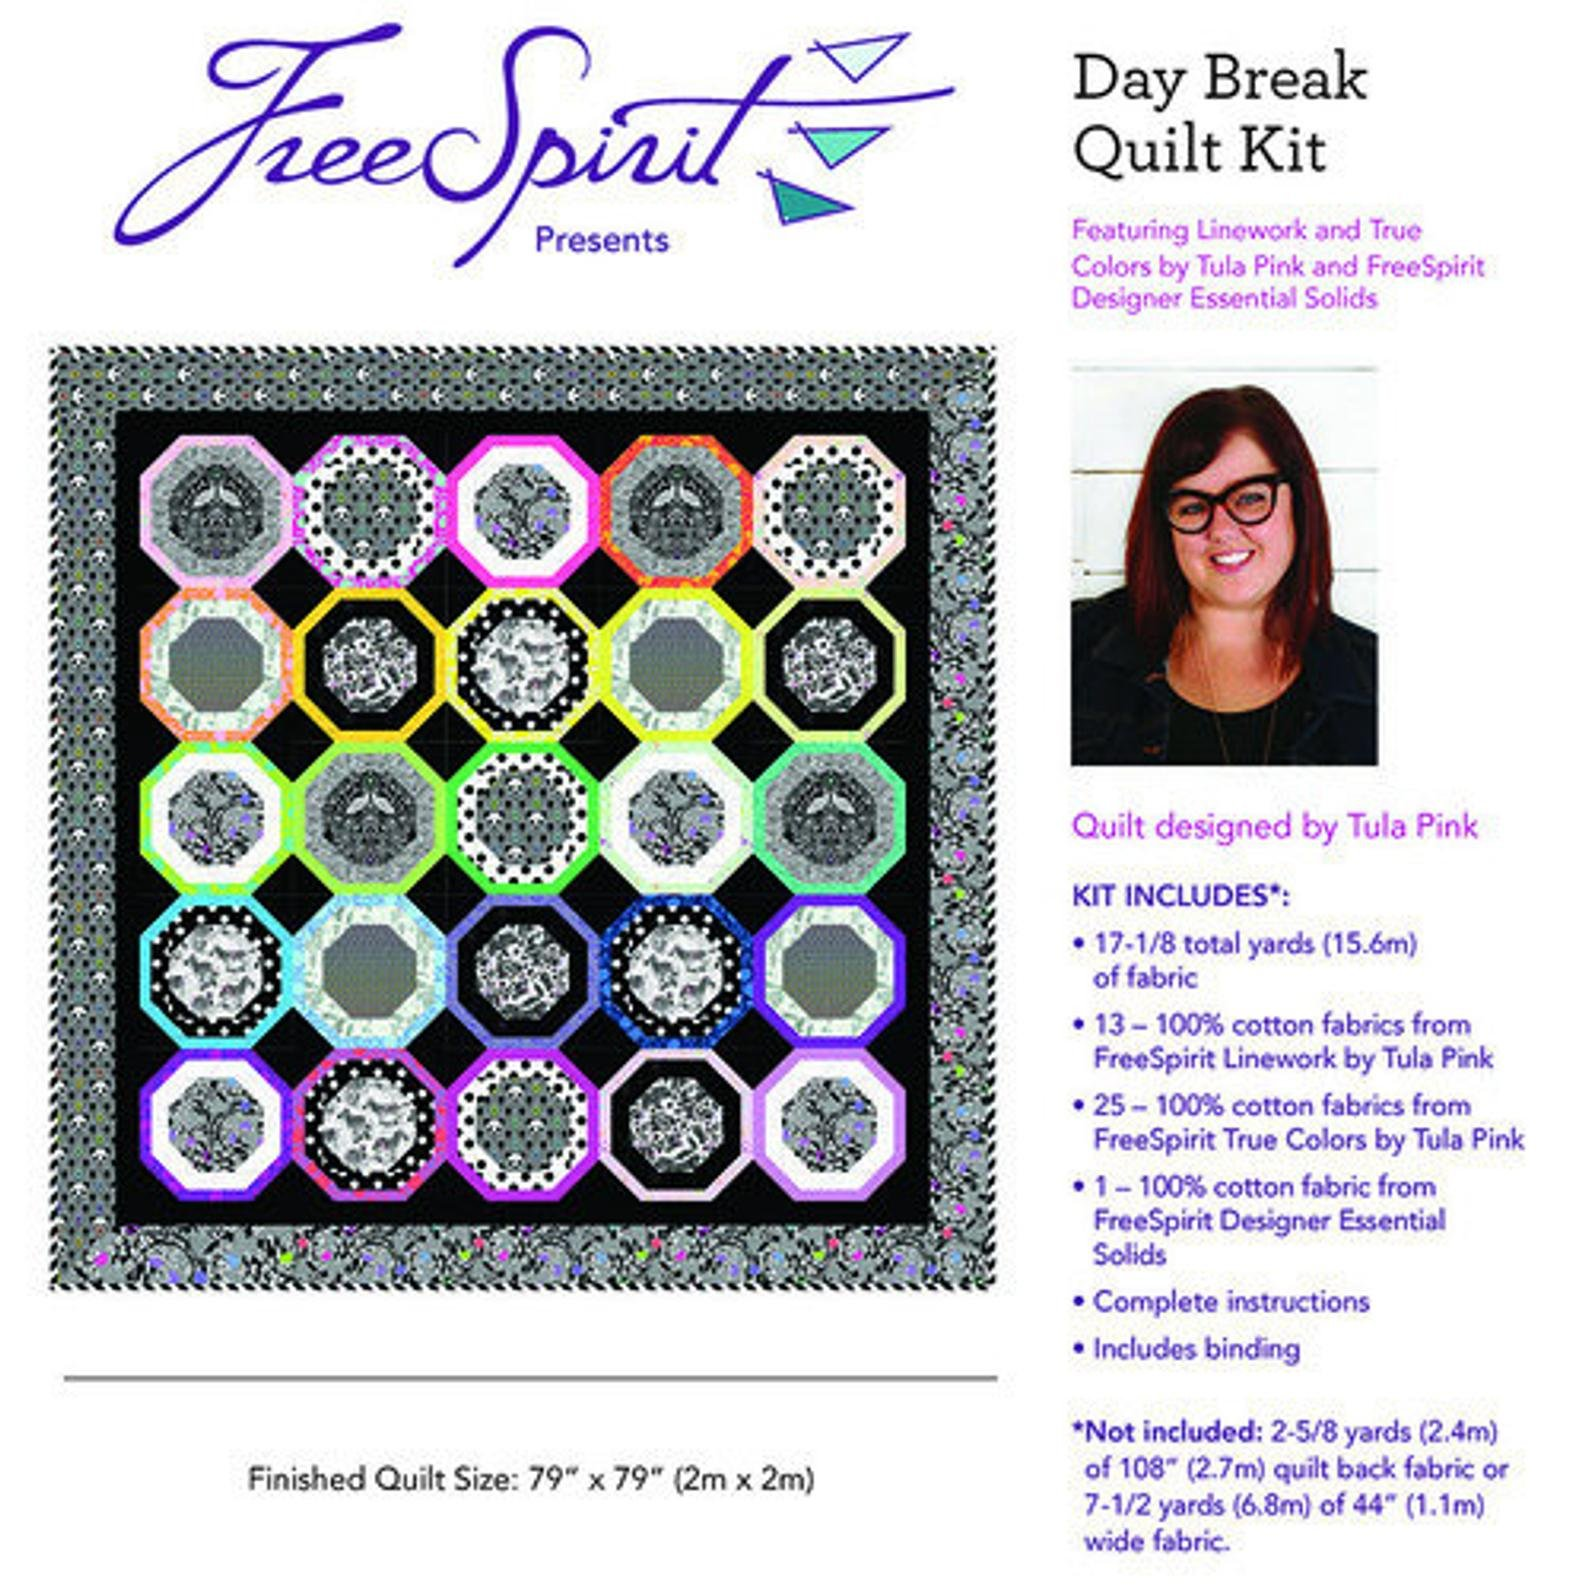 Linework Daybreak Quilt Kit KITQTTP.DAYBREAK by Tula Pink